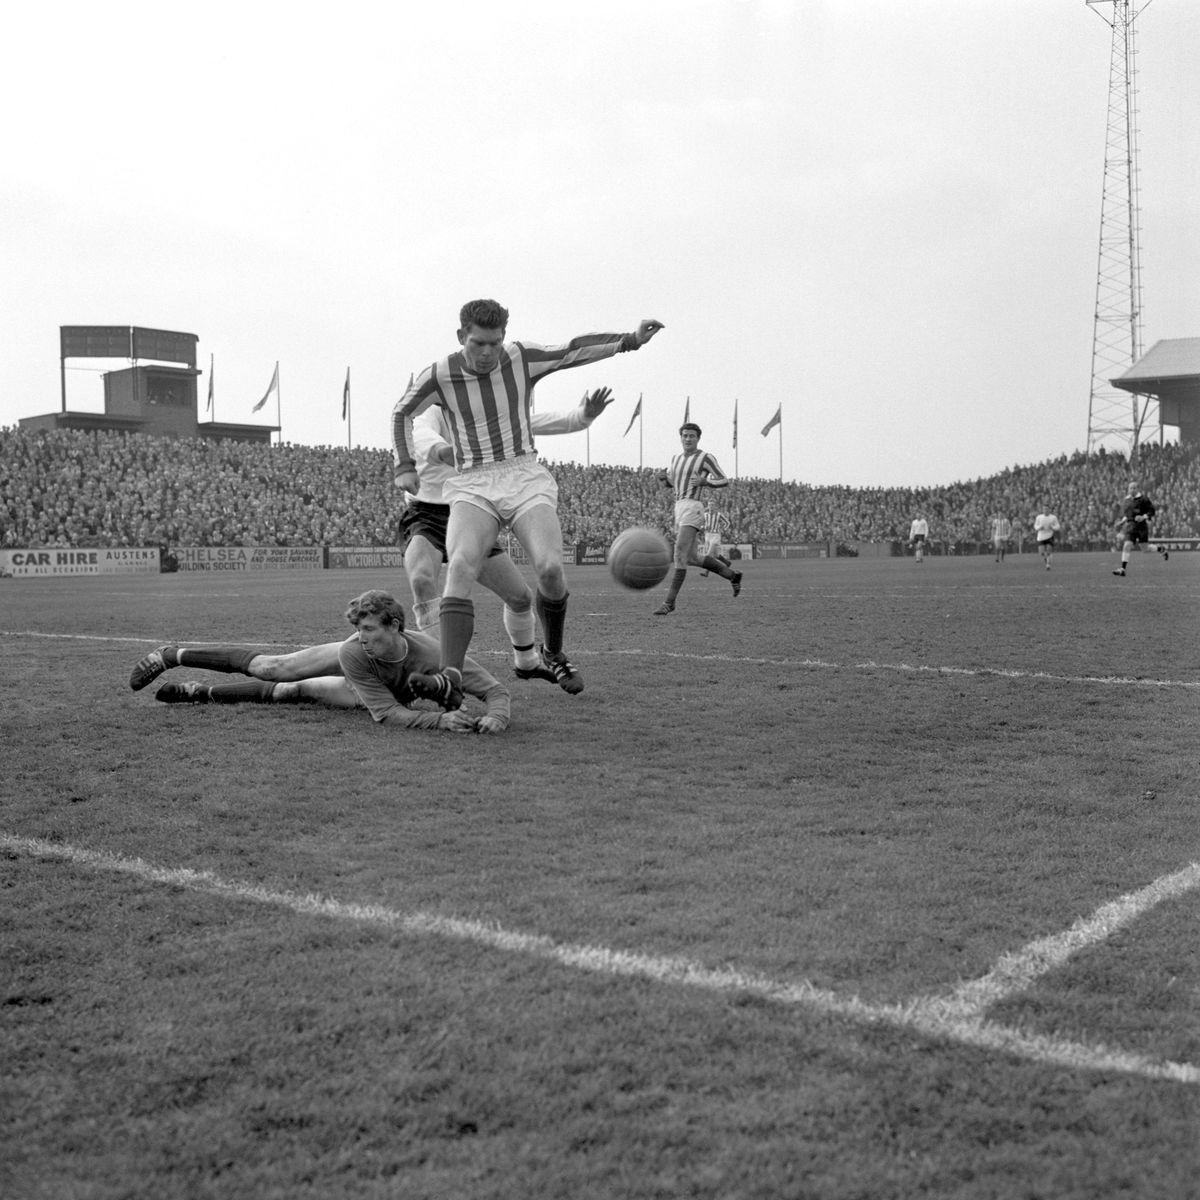 Soccer - League Division One - Sunderland v Liverpool - Roker Park - Sunderland - 1966